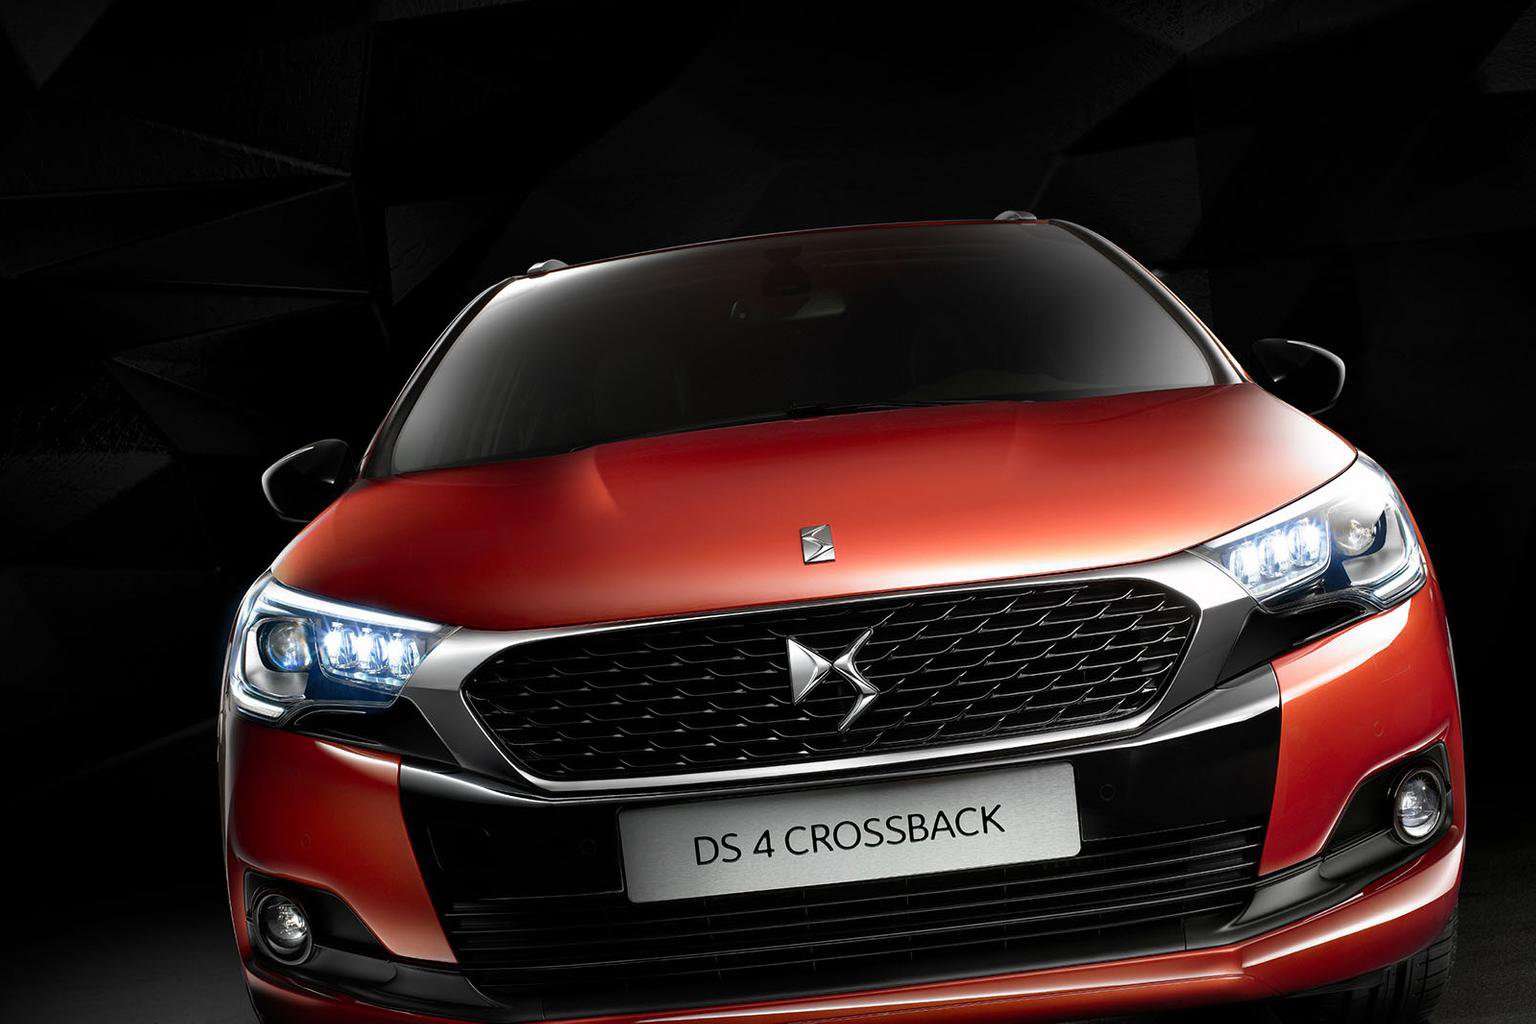 2015 DS 4 facelift revealed